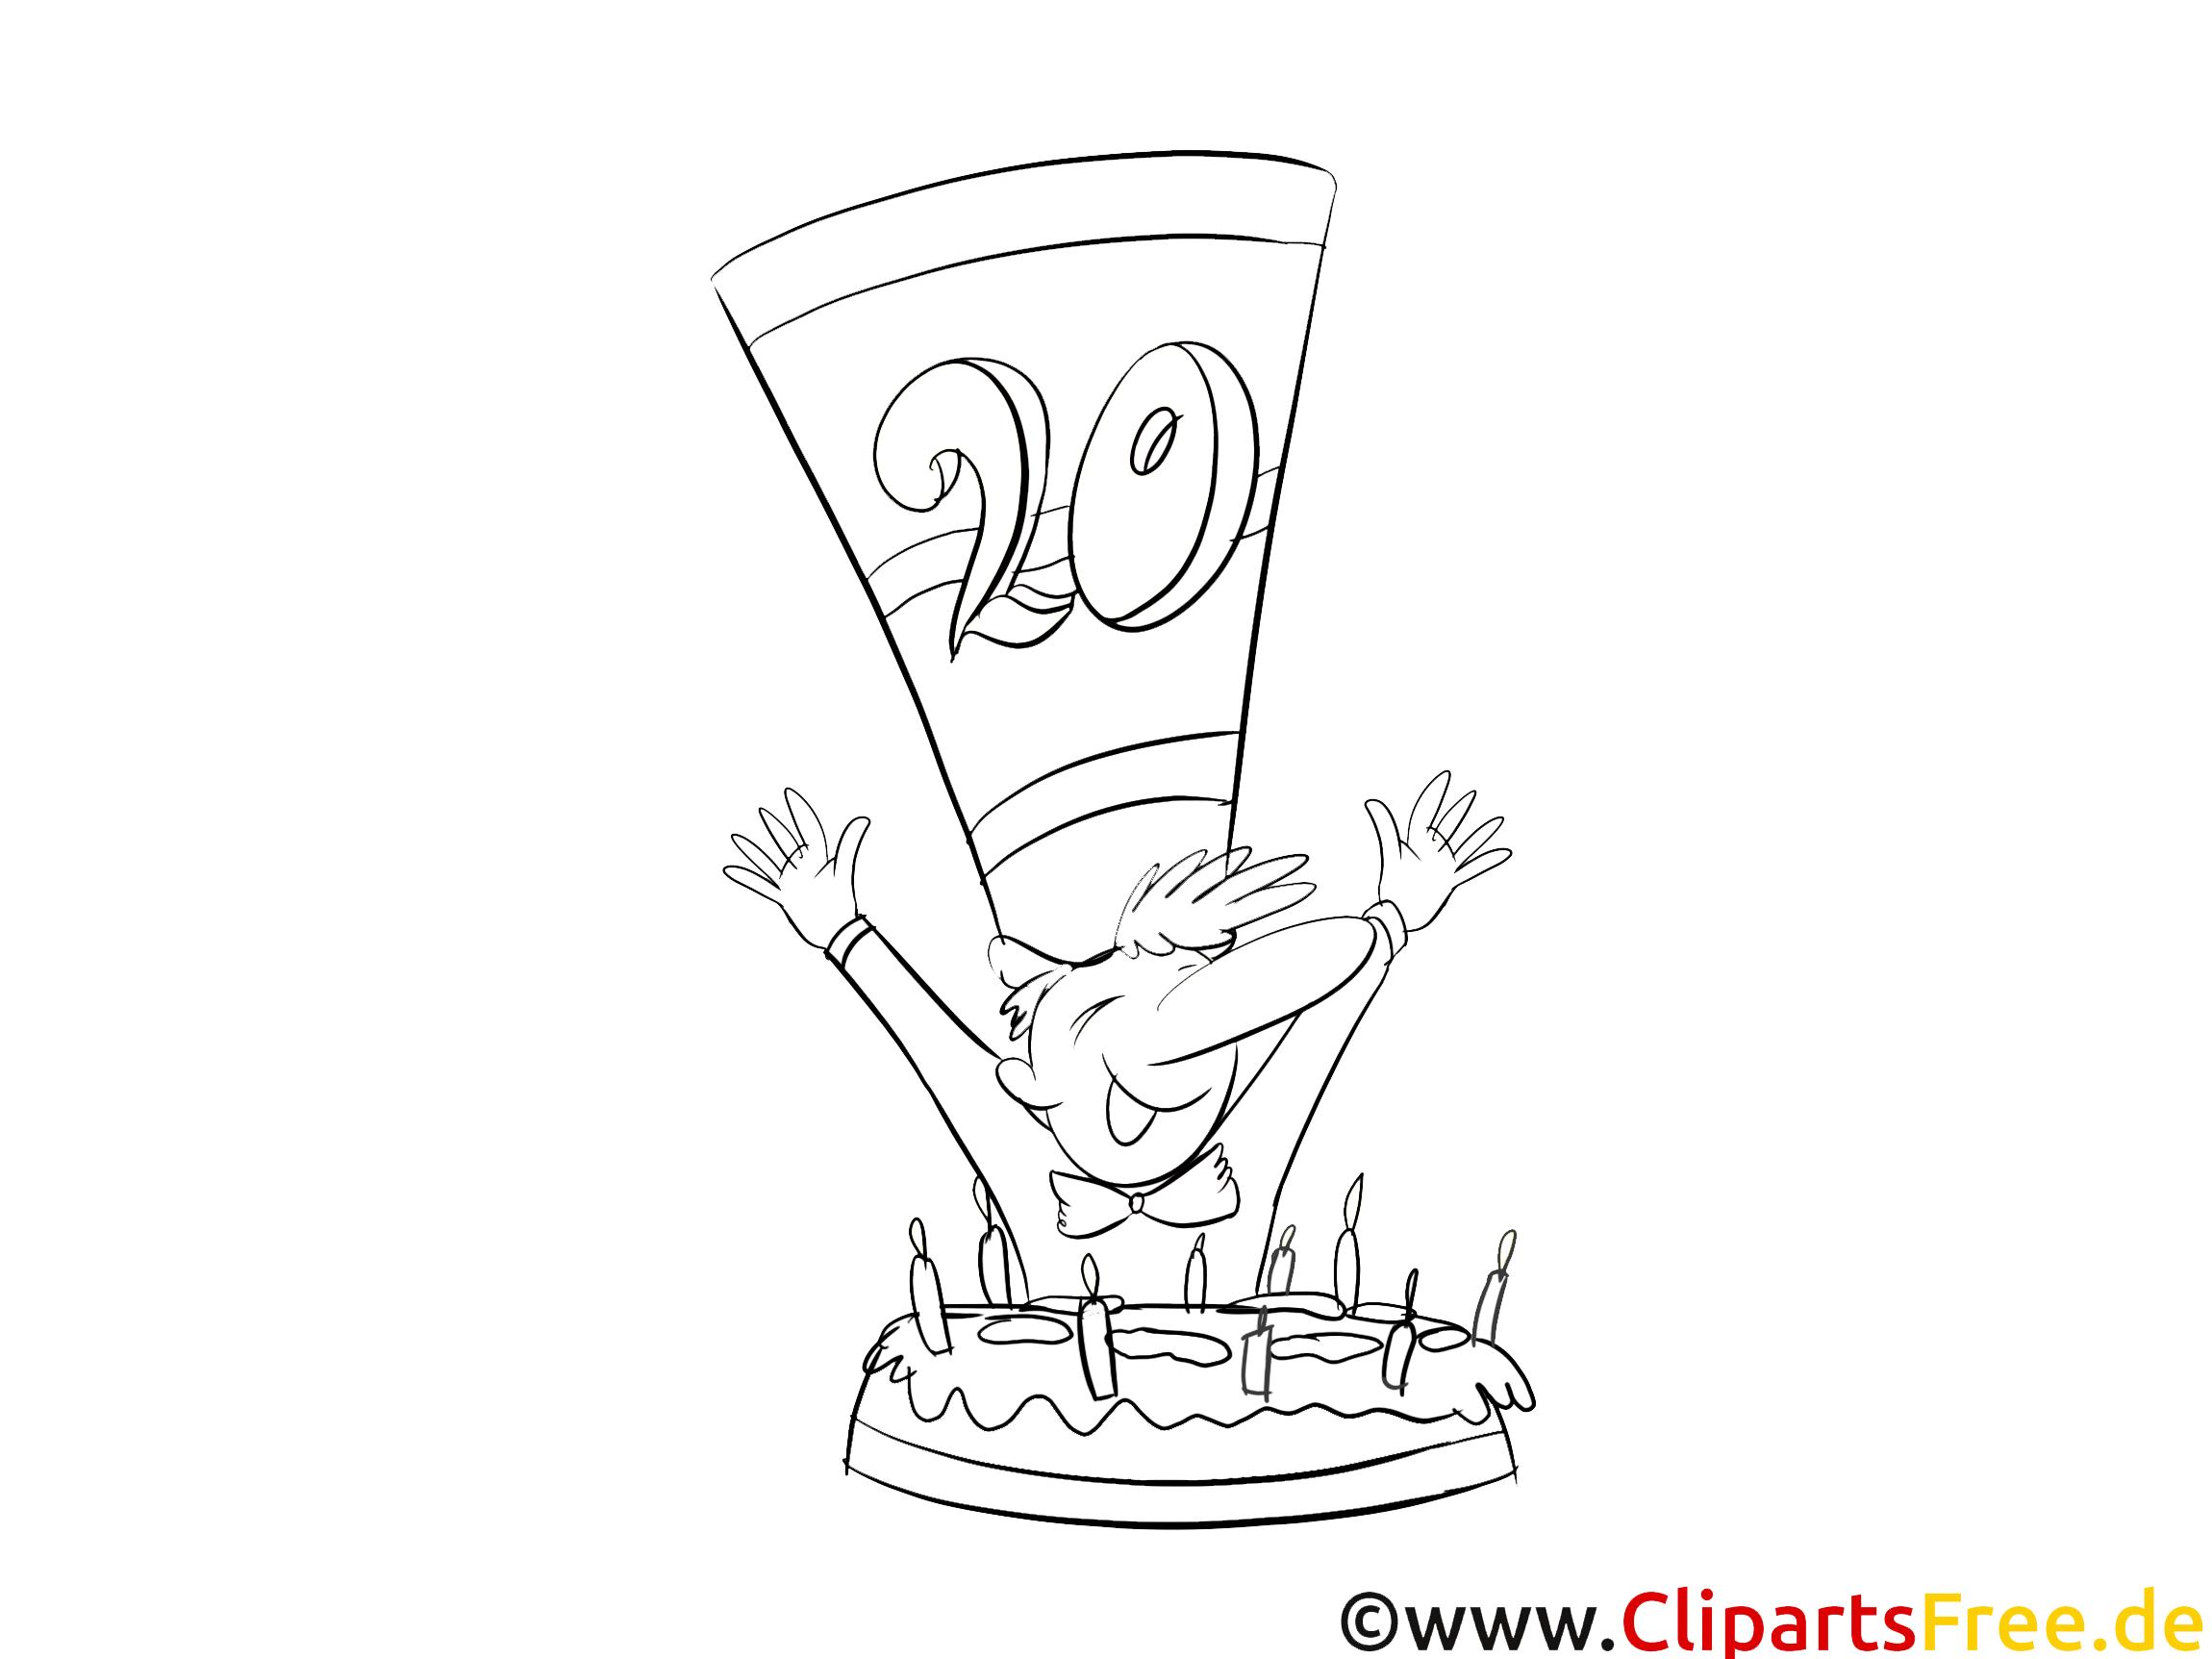 Mal Bild zum Geburtstag